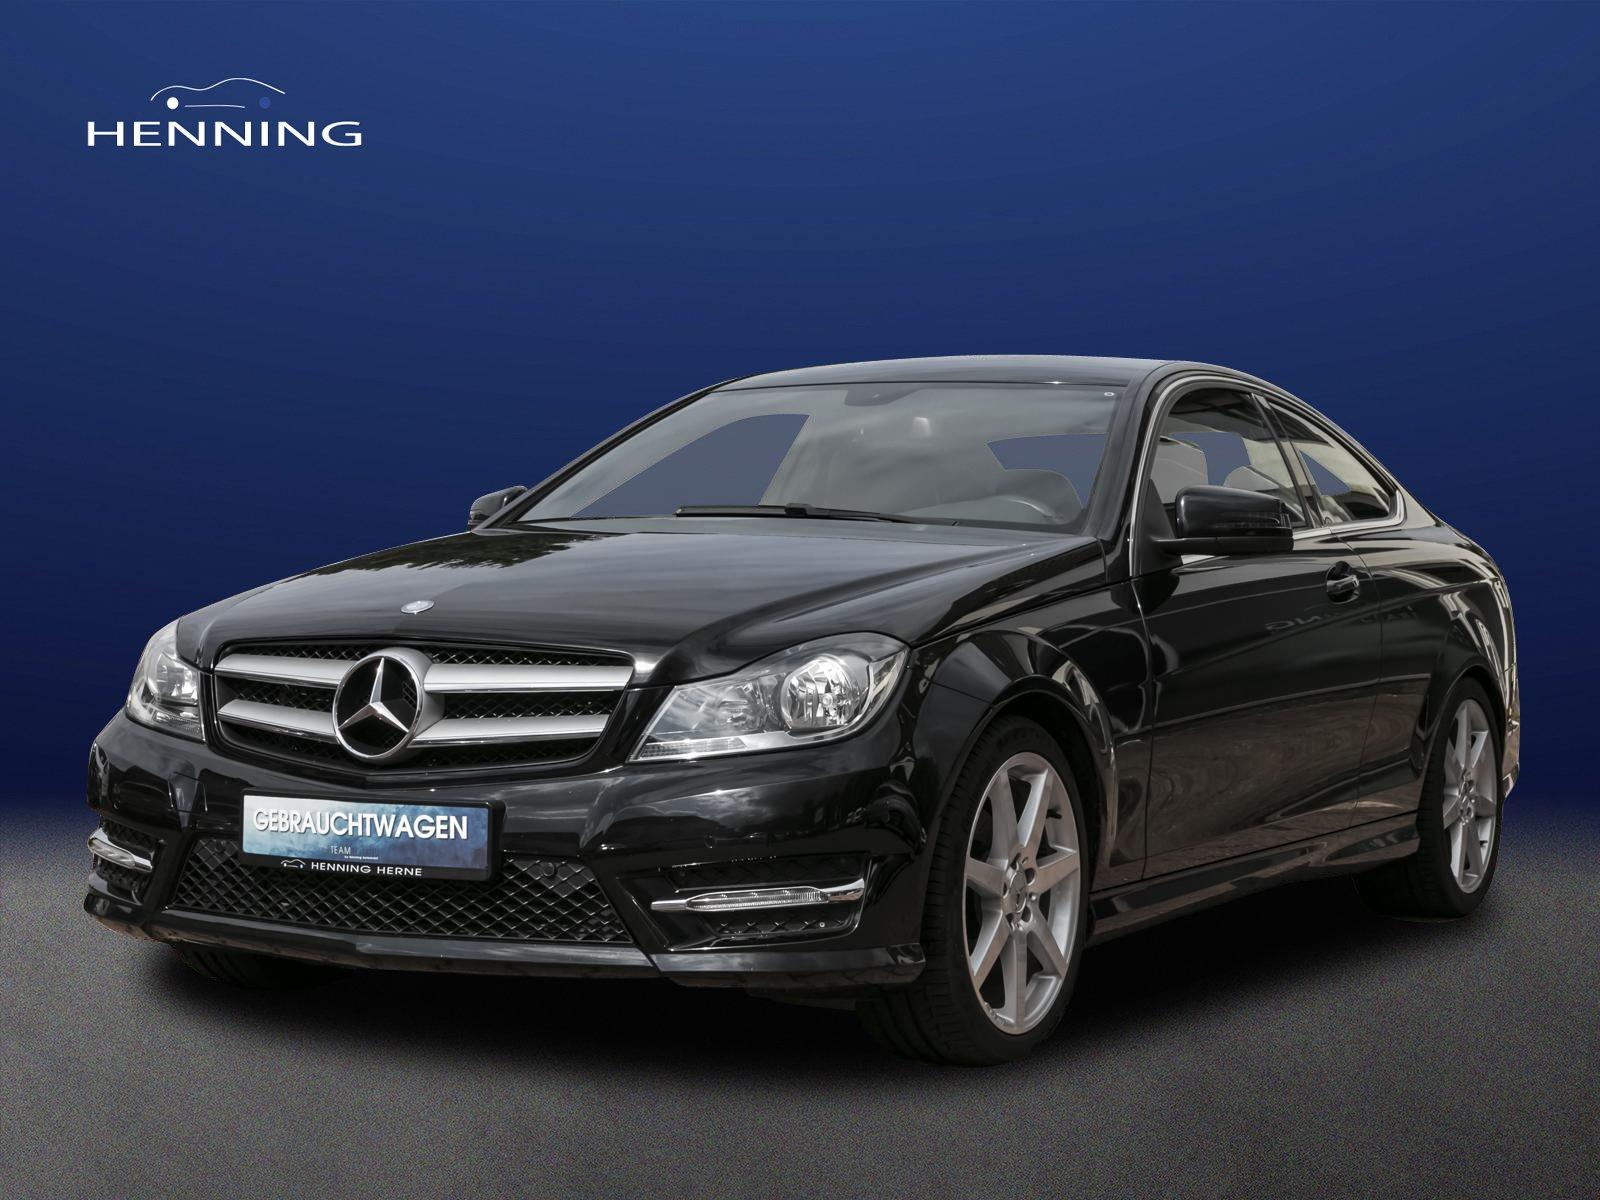 Mercedes-Benz C 180 CGI Sportpaket AMG Automatik SHZ PTS, Jahr 2013, Benzin